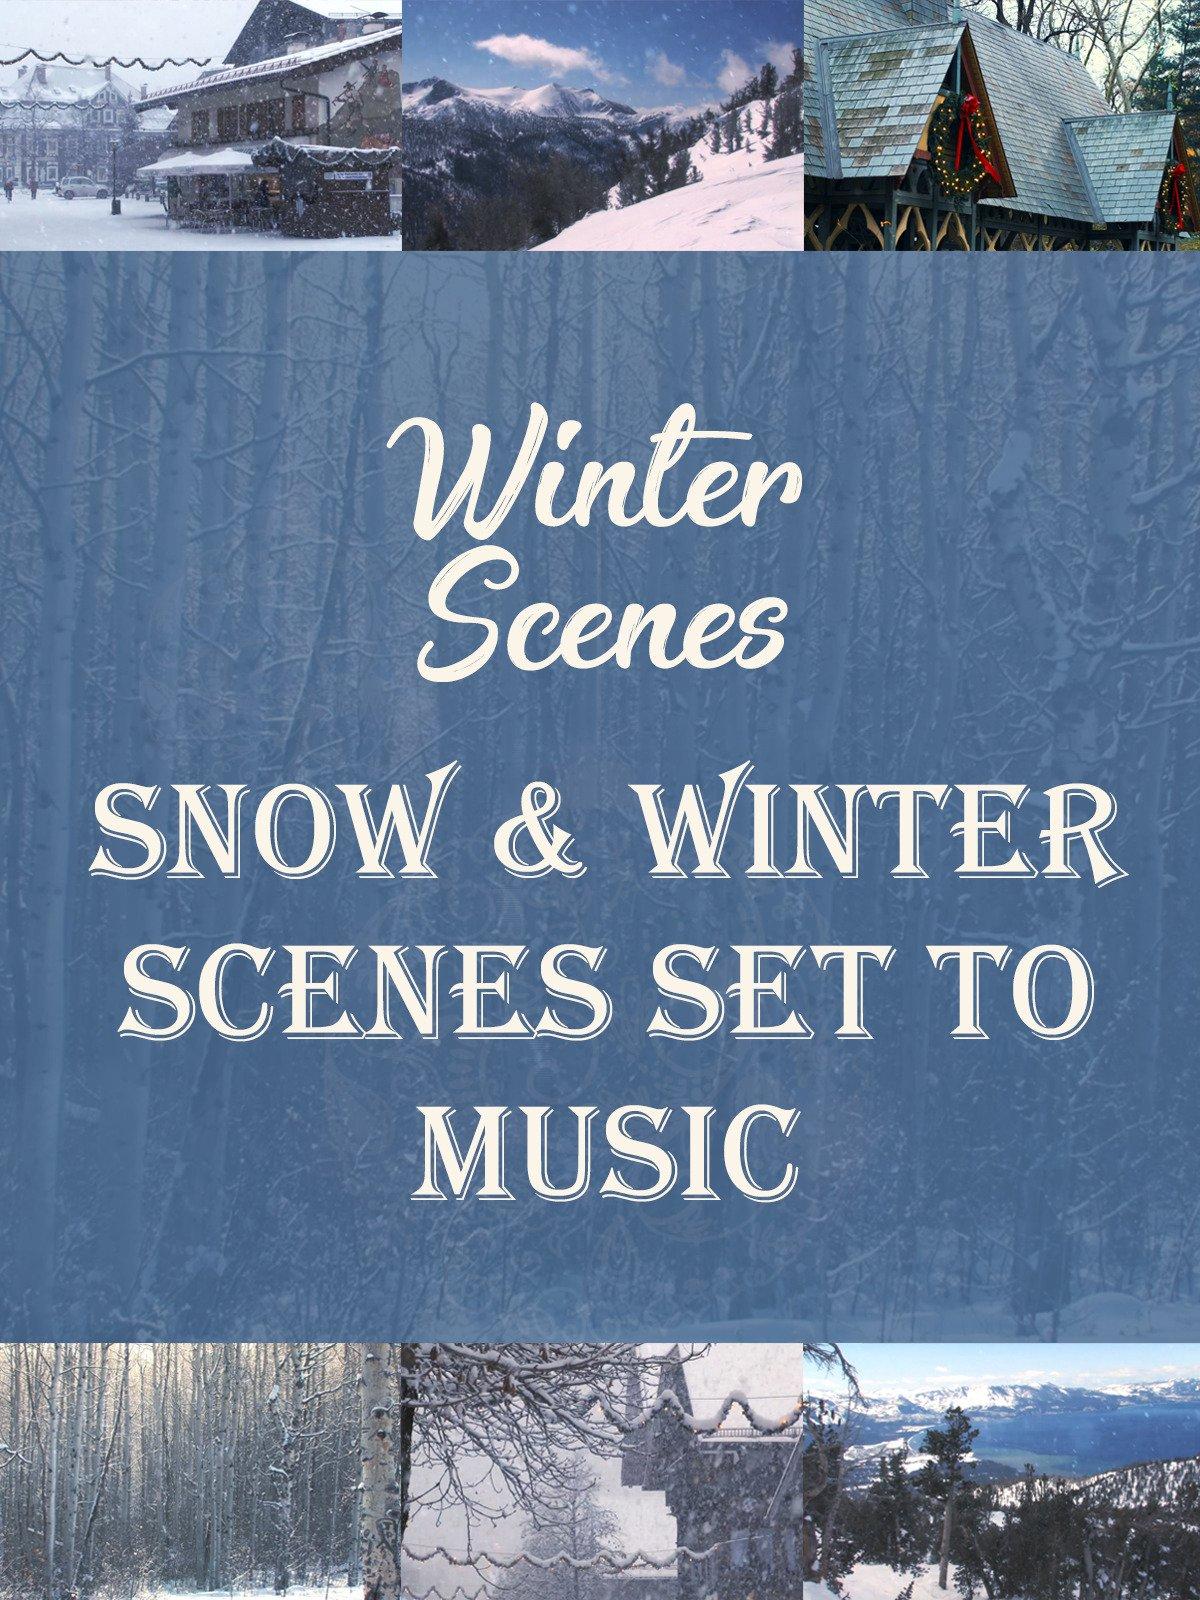 Winter & Snow Scenes Set to Music